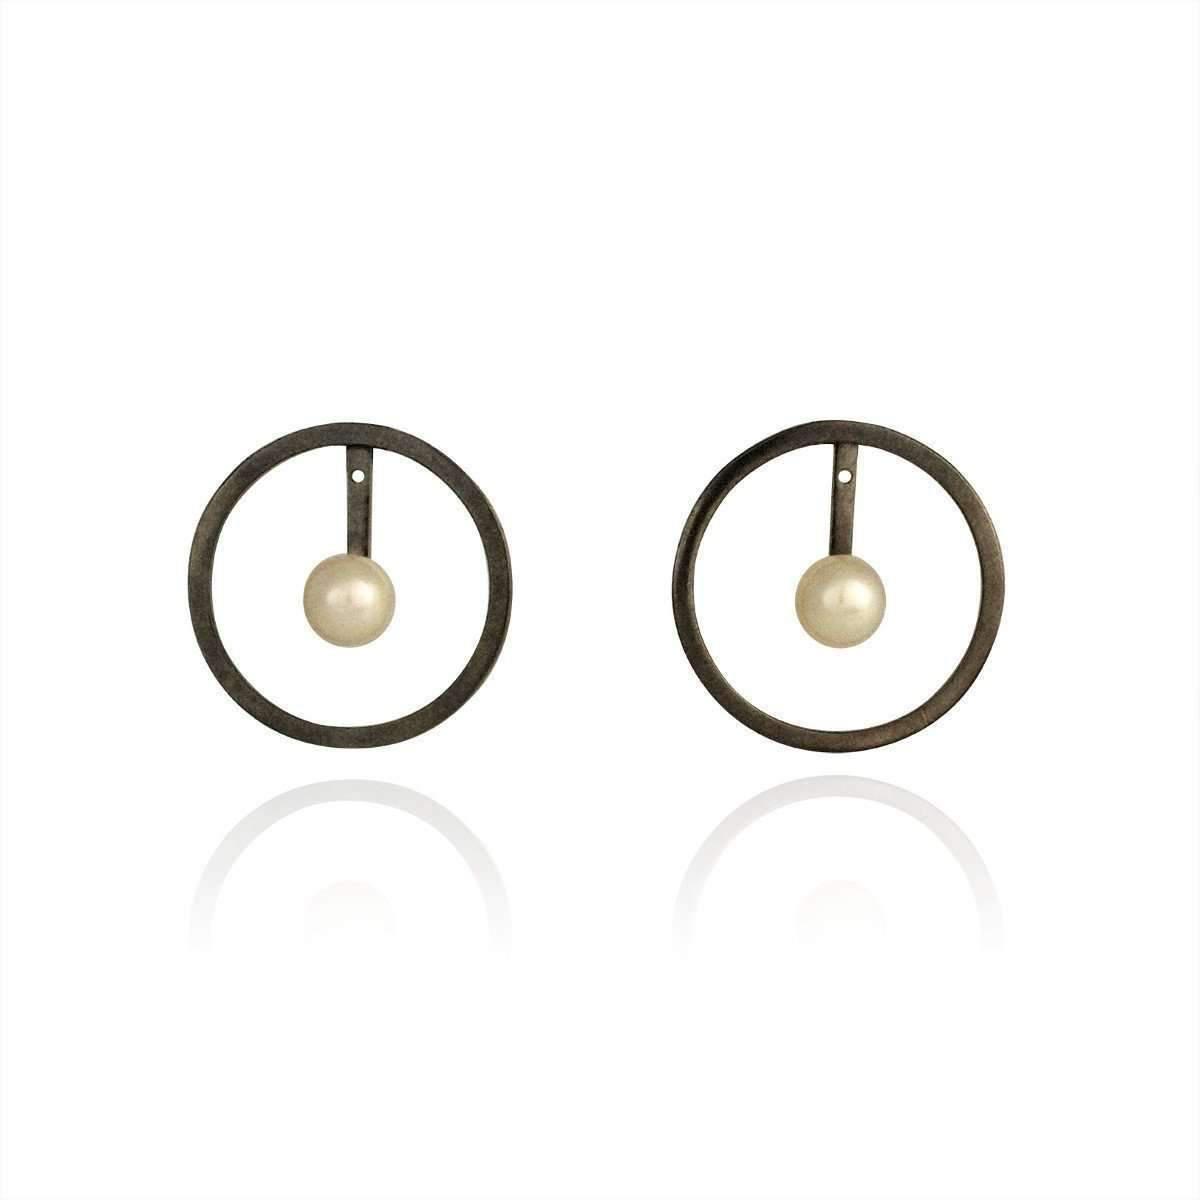 Cara Tonkin Oxidised Silver Orbit Halo Front And Back Earrings Htgl0d